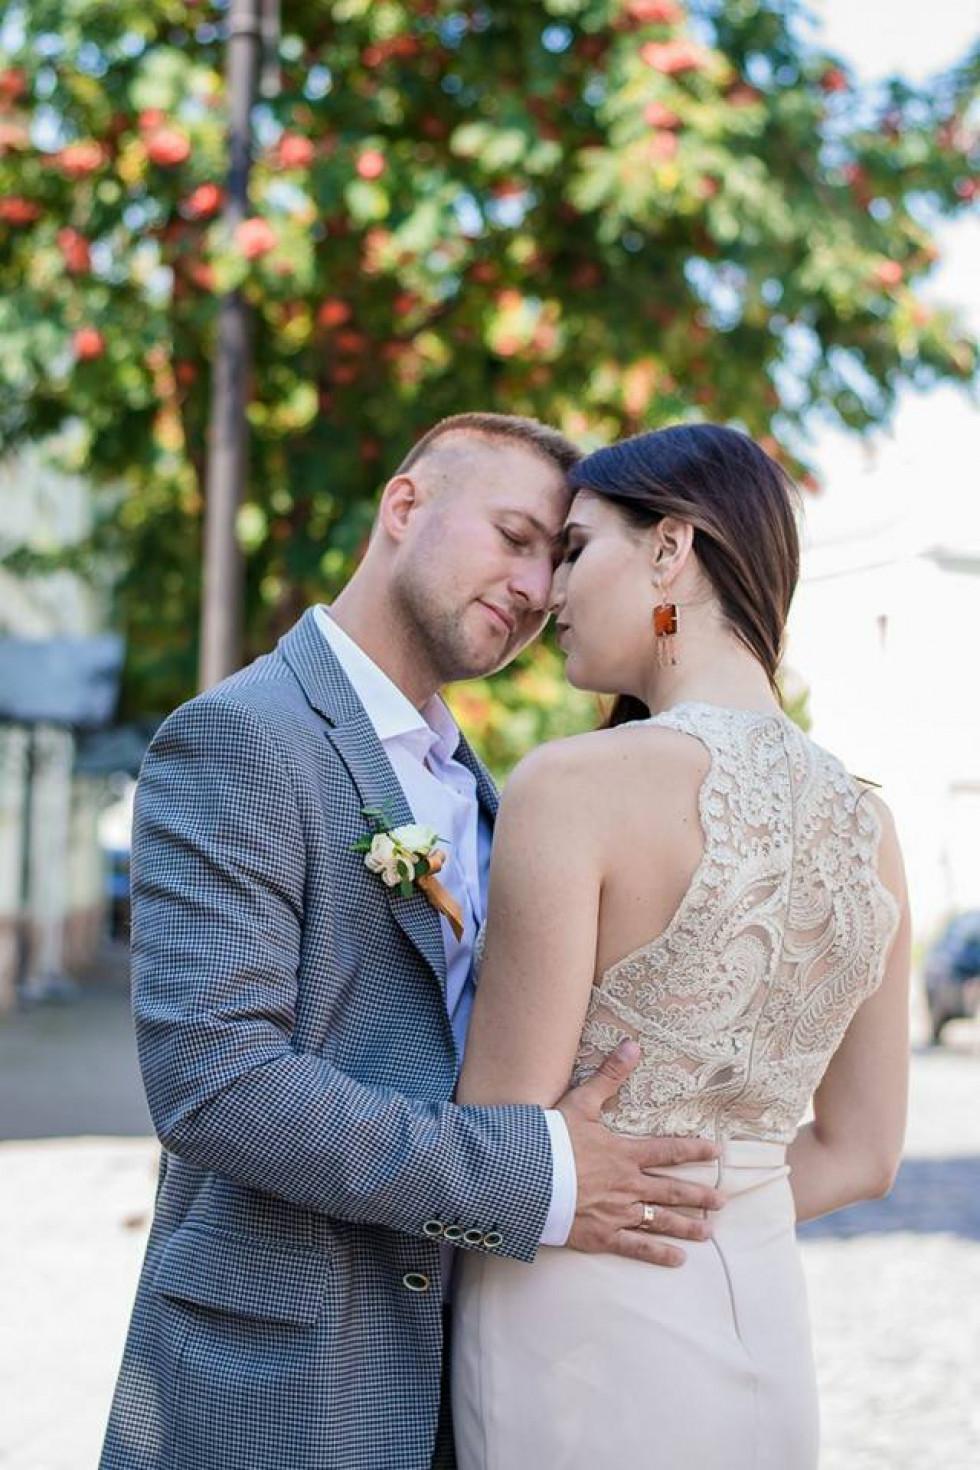 Одружився син депутата Луцькради - Район Луцьк 365907ae600c2